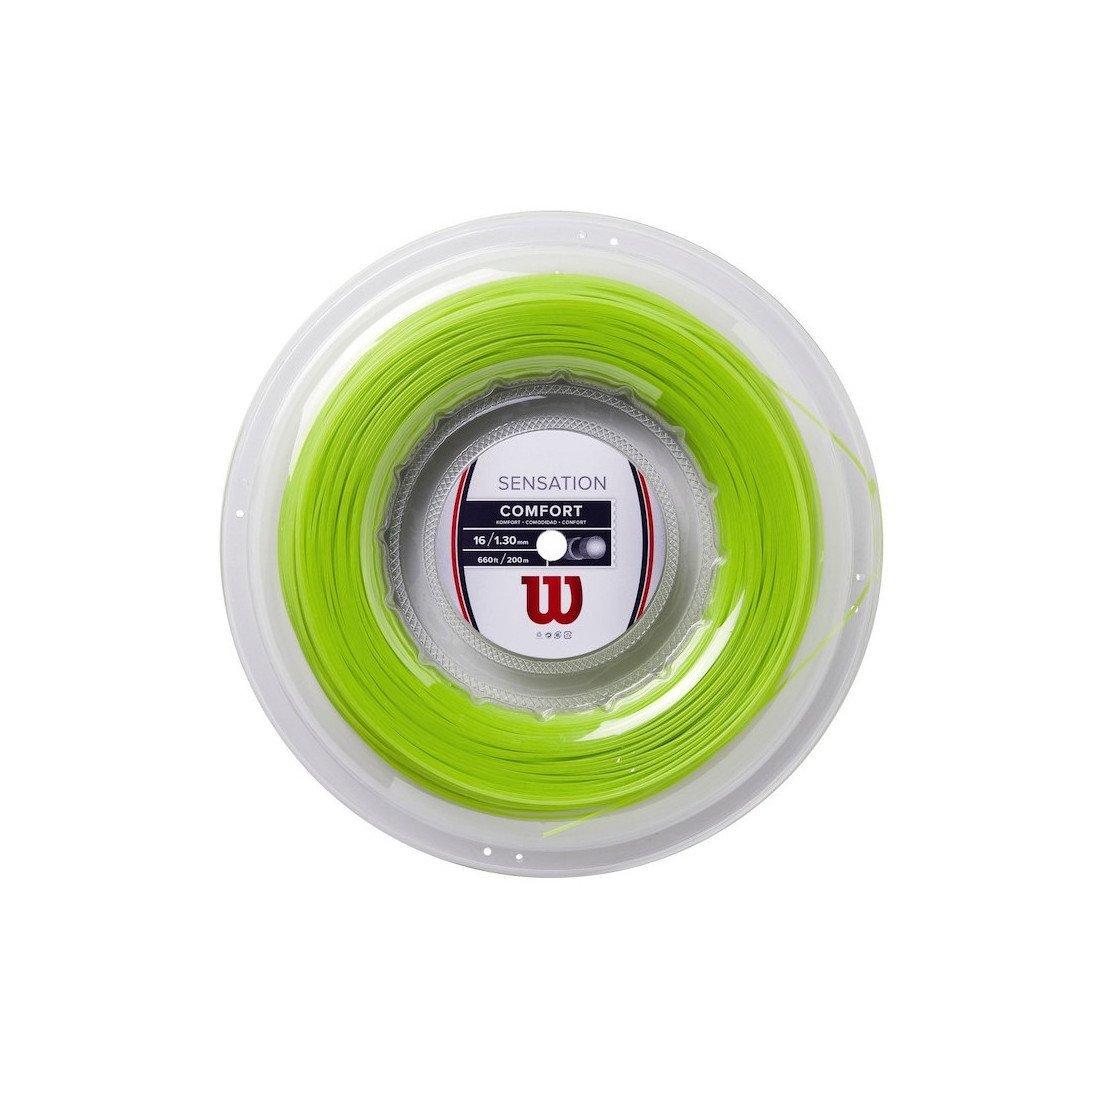 Wilson Tennis Accessories – Sensation Tennis String - Reel